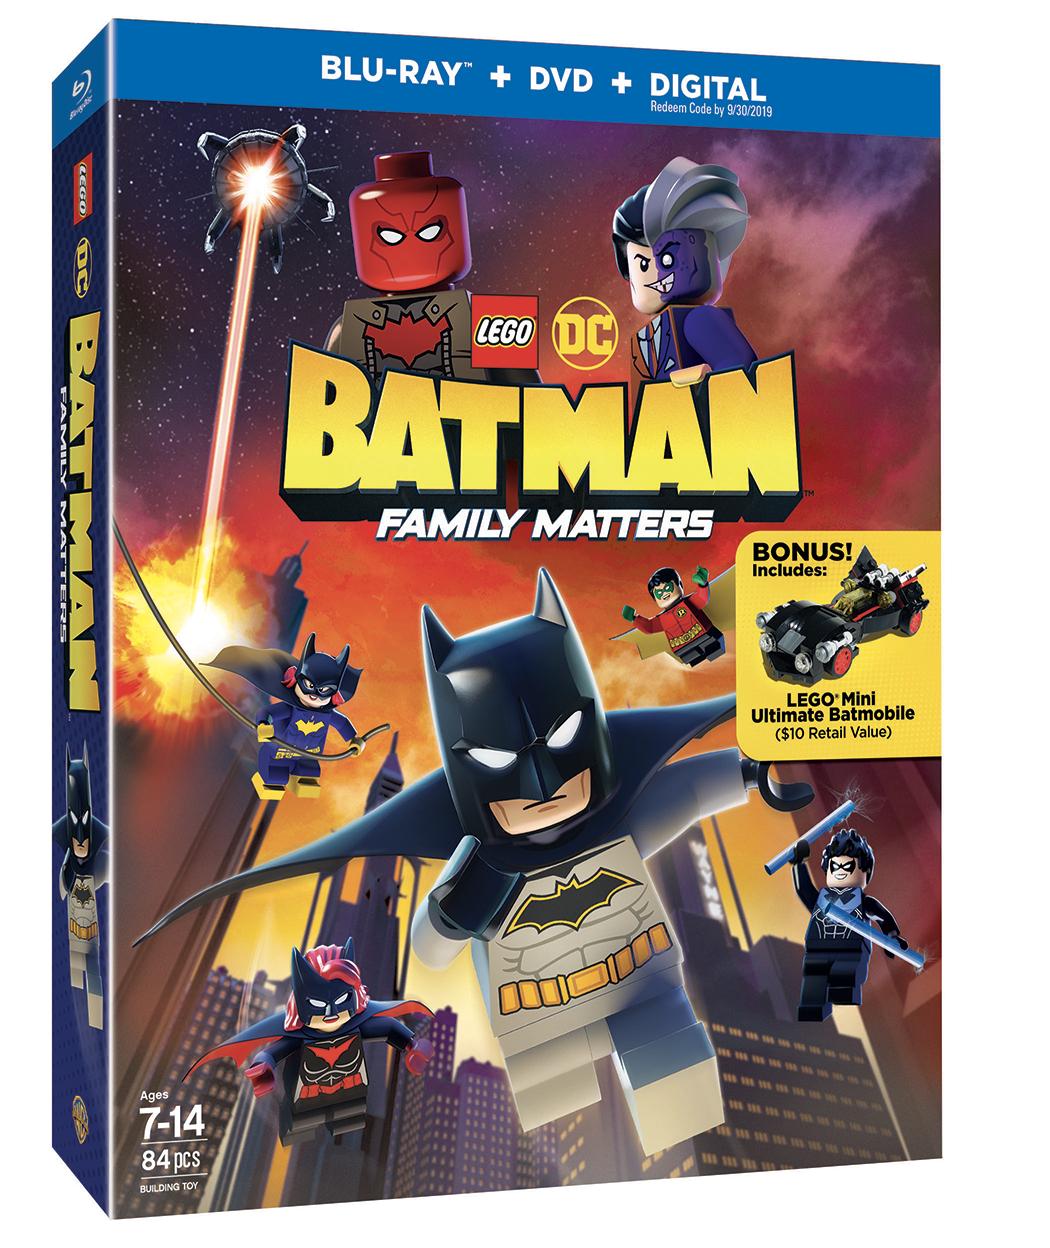 LEGO DC Batman Family Matters Blu-ray Combo 3D.jpg